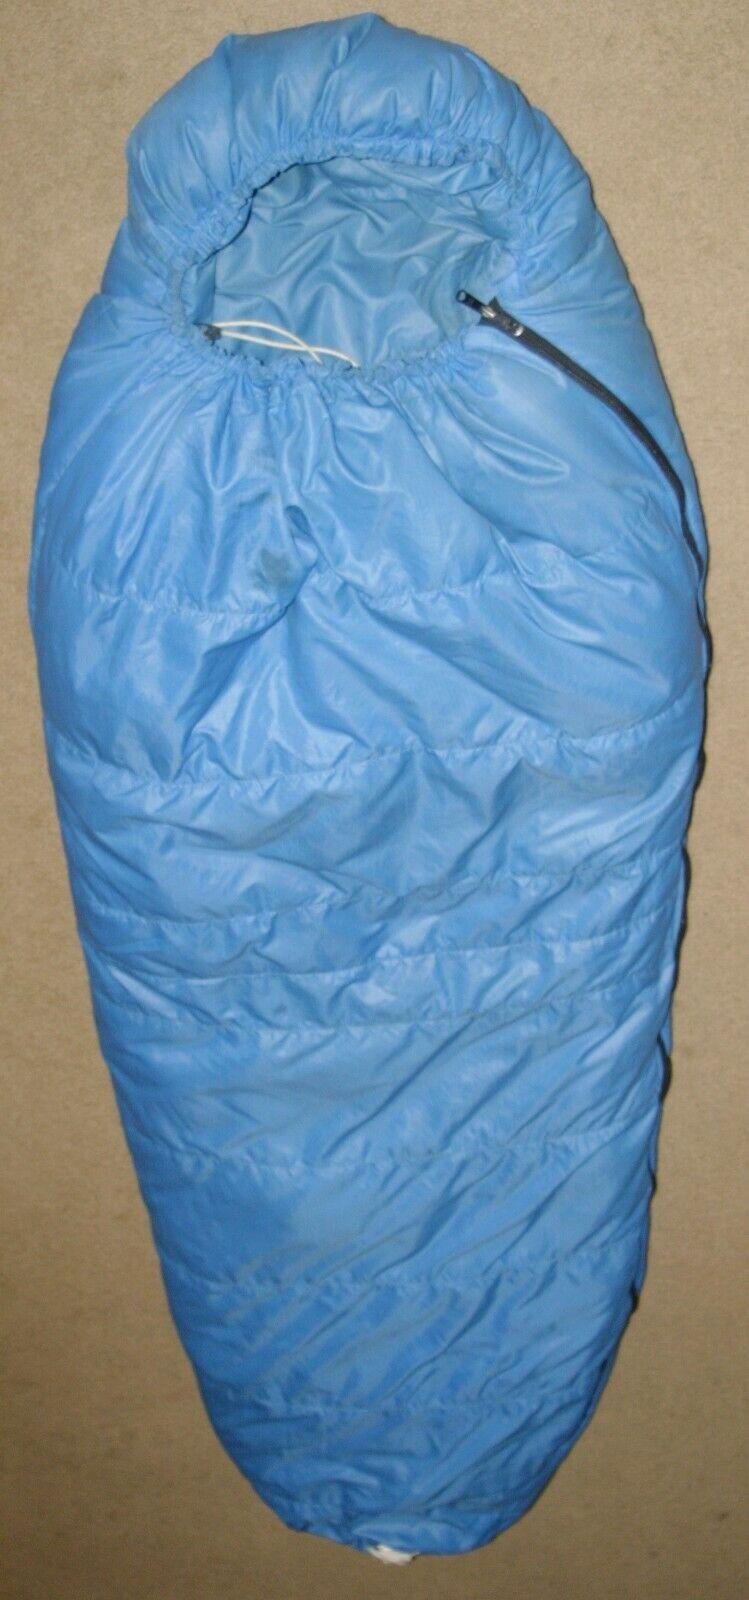 Antiguo North Woods USA Norte de plumas de ganso Momia Saco de Dormir Azul 84  limpio GUC